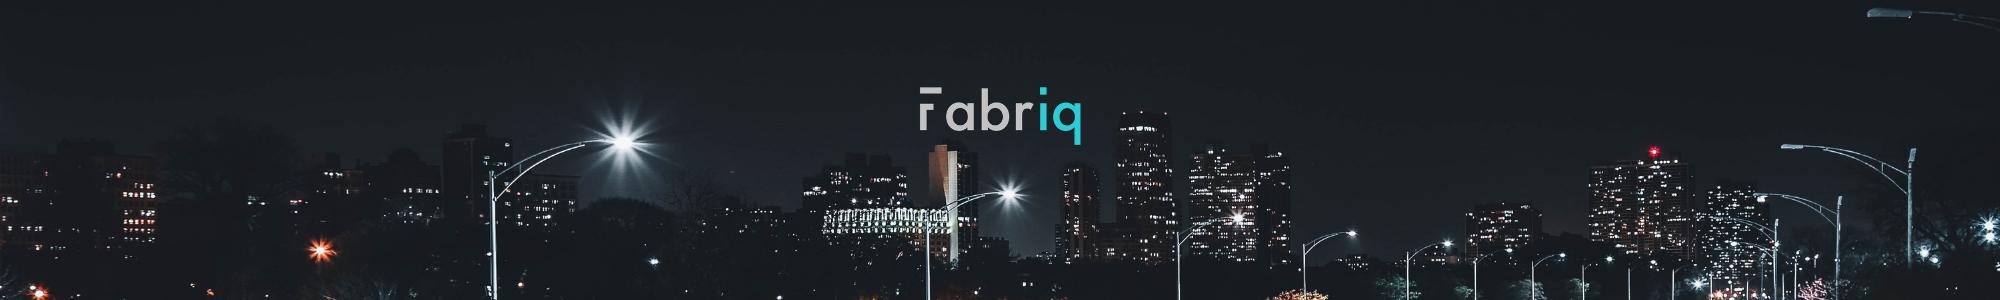 Fabriq - Smart Connected Spaces